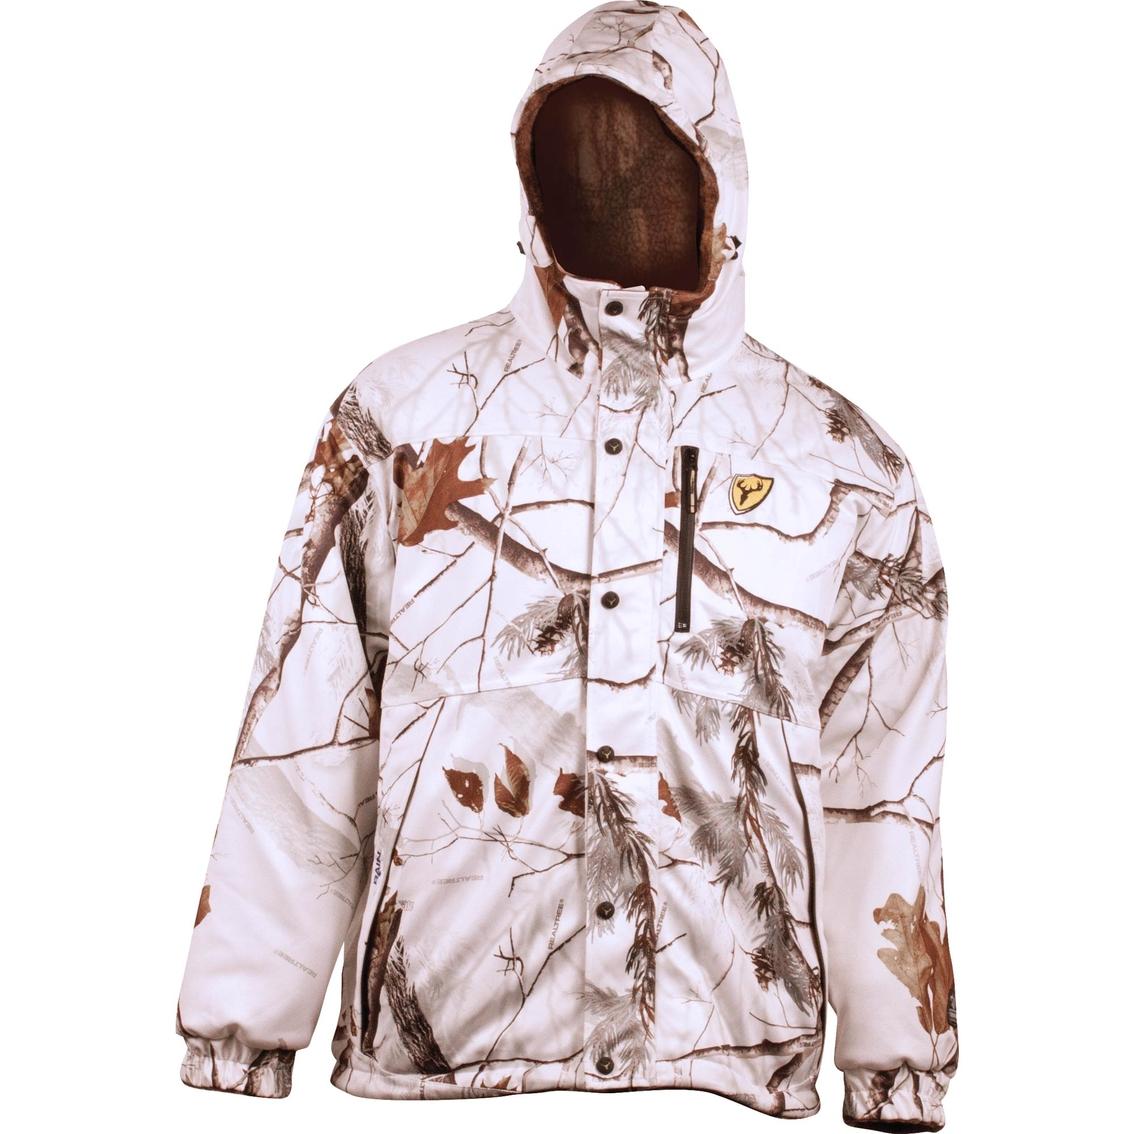 3b21343e28df3 Scentblocker Northern Extreme Reversible Jacket | Hunting Apparel ...